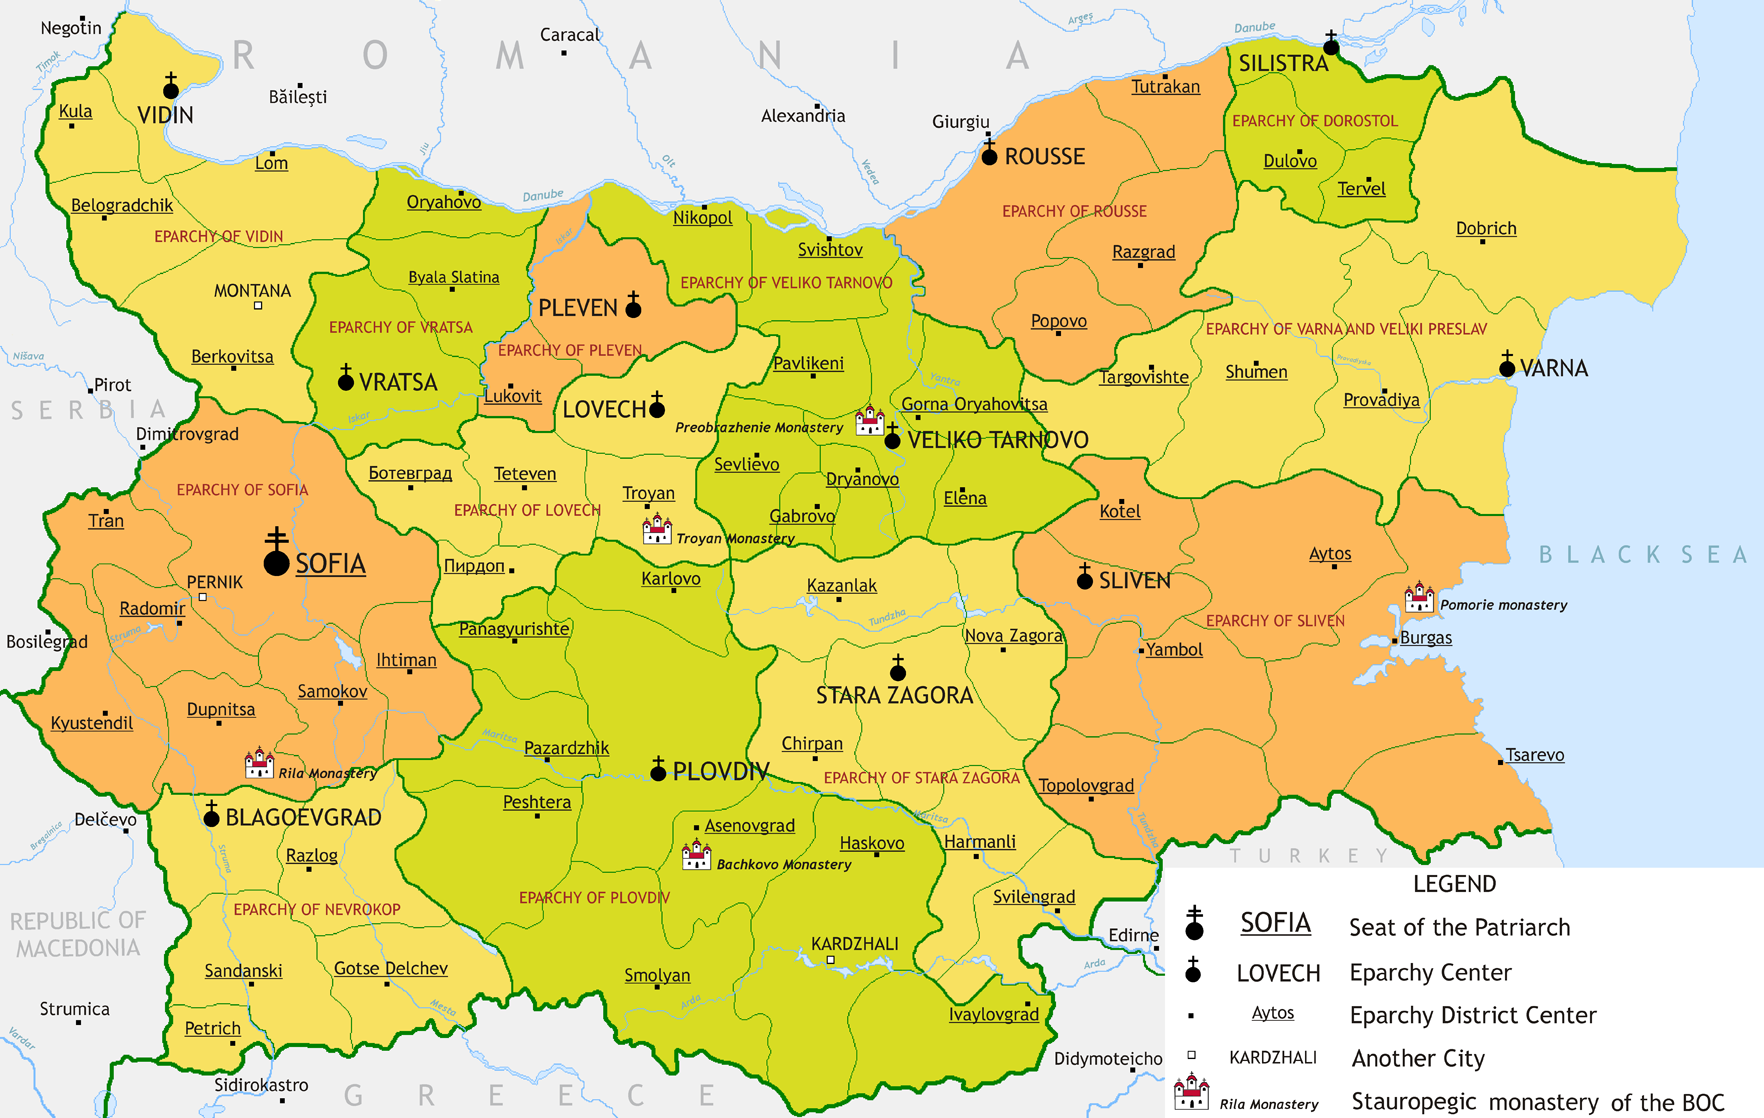 Karte Bulgarien.Landkarte Bulgarien Karte Bezirke Der Orthodoxen Kirche